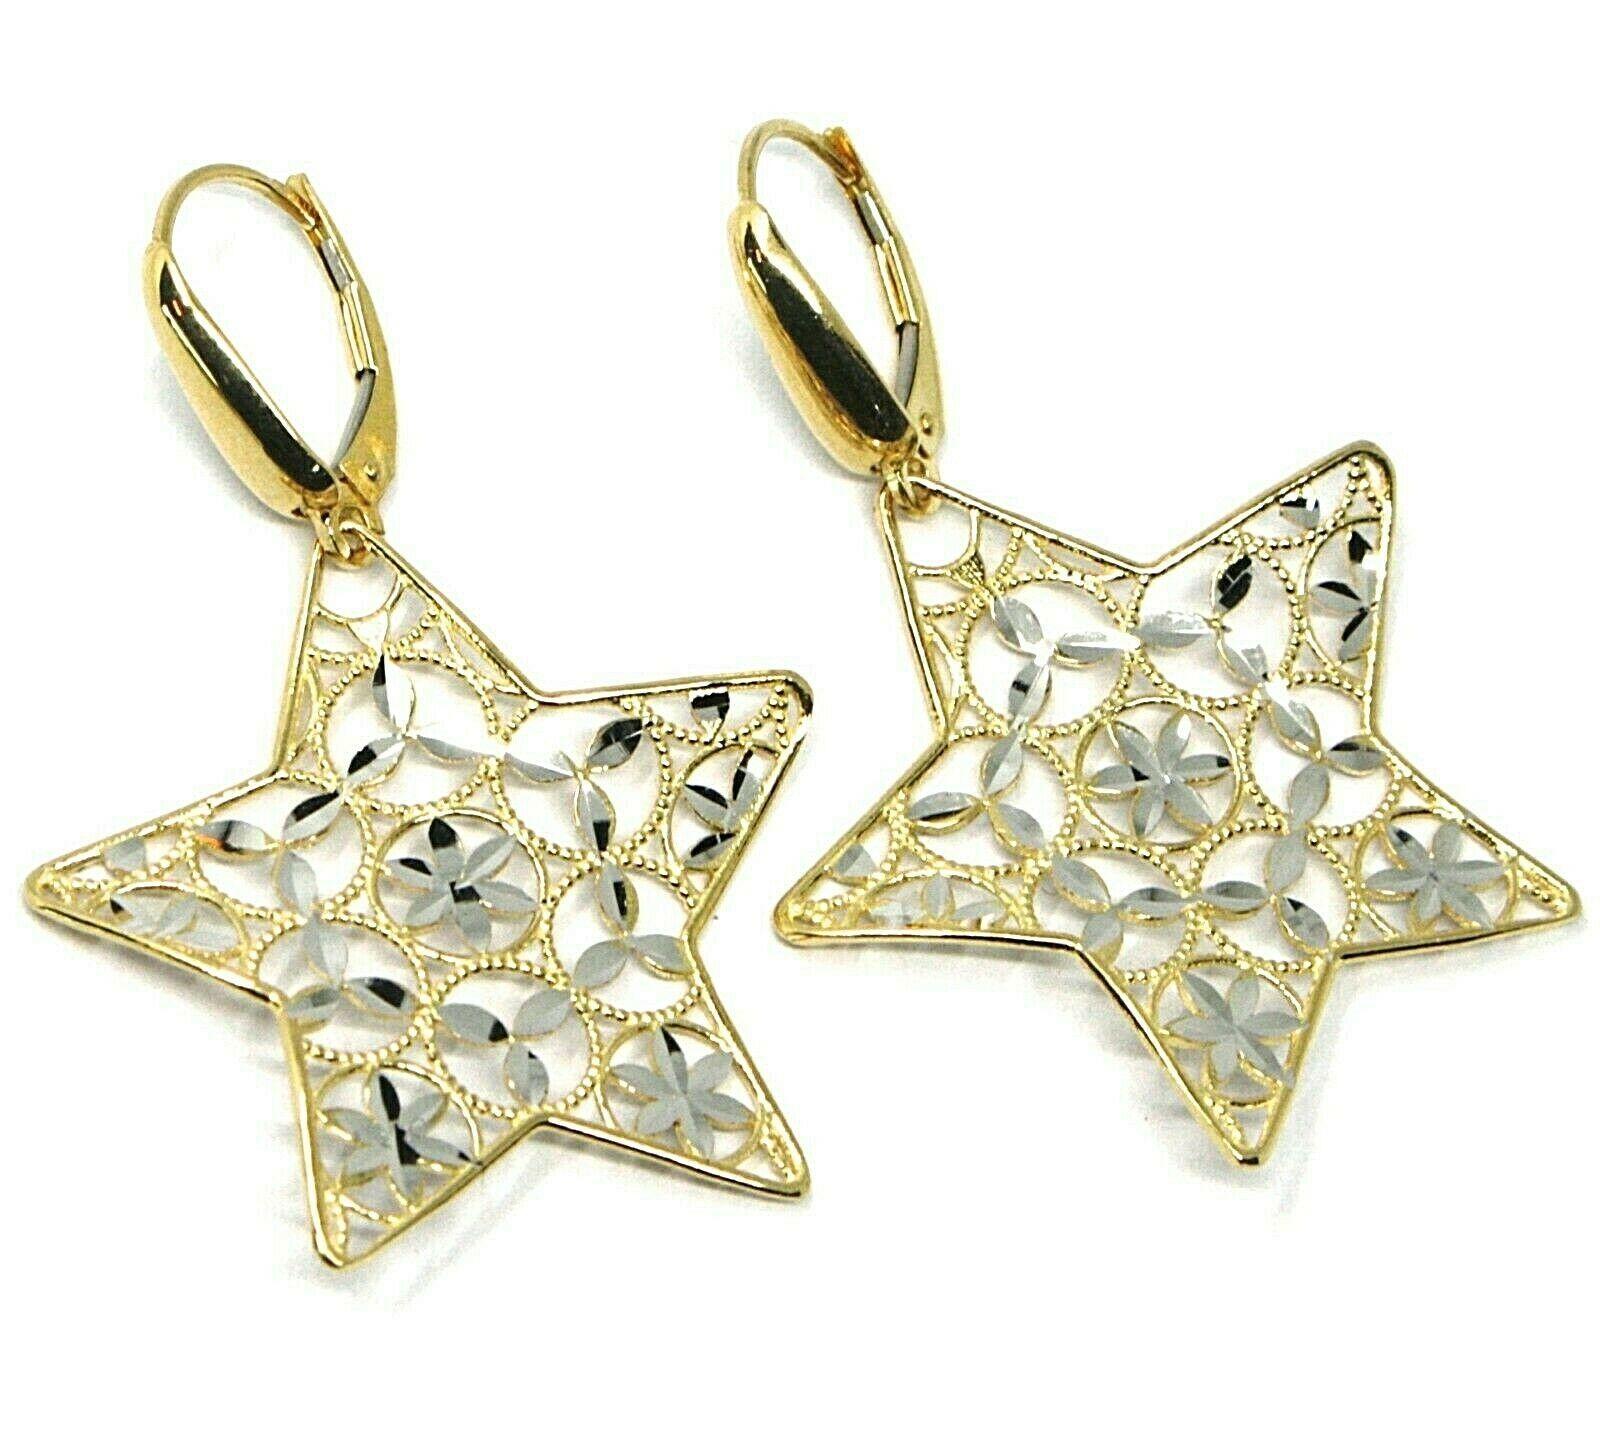 18K YELLOW WHITE GOLD PENDANT EARRINGS ONDULATE WORKED STAR, SHINY, STRIPED